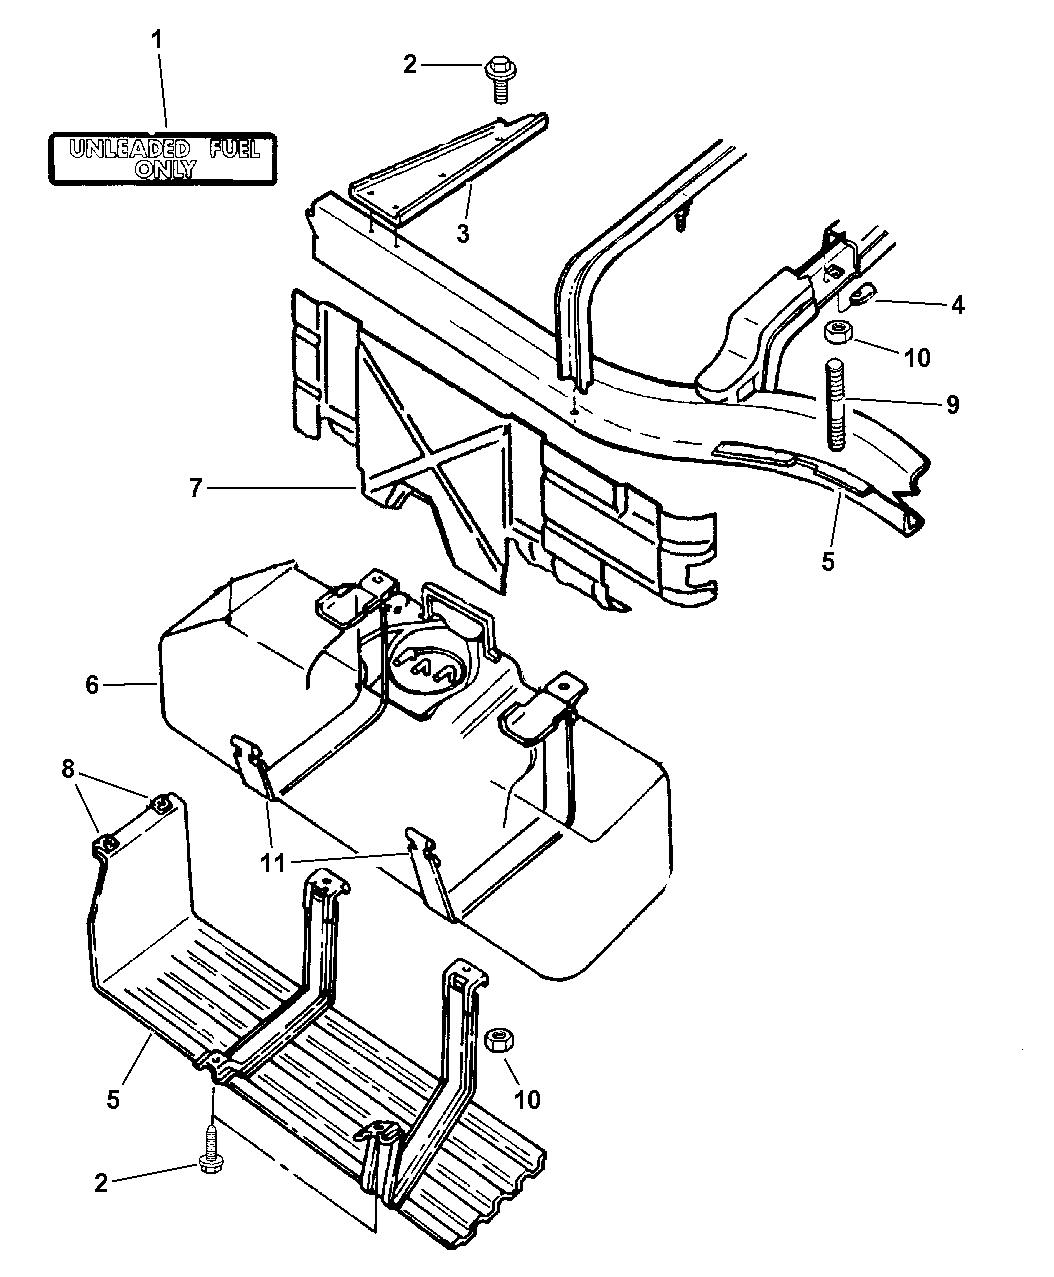 1998 Dodge Dakota Fuel Tank